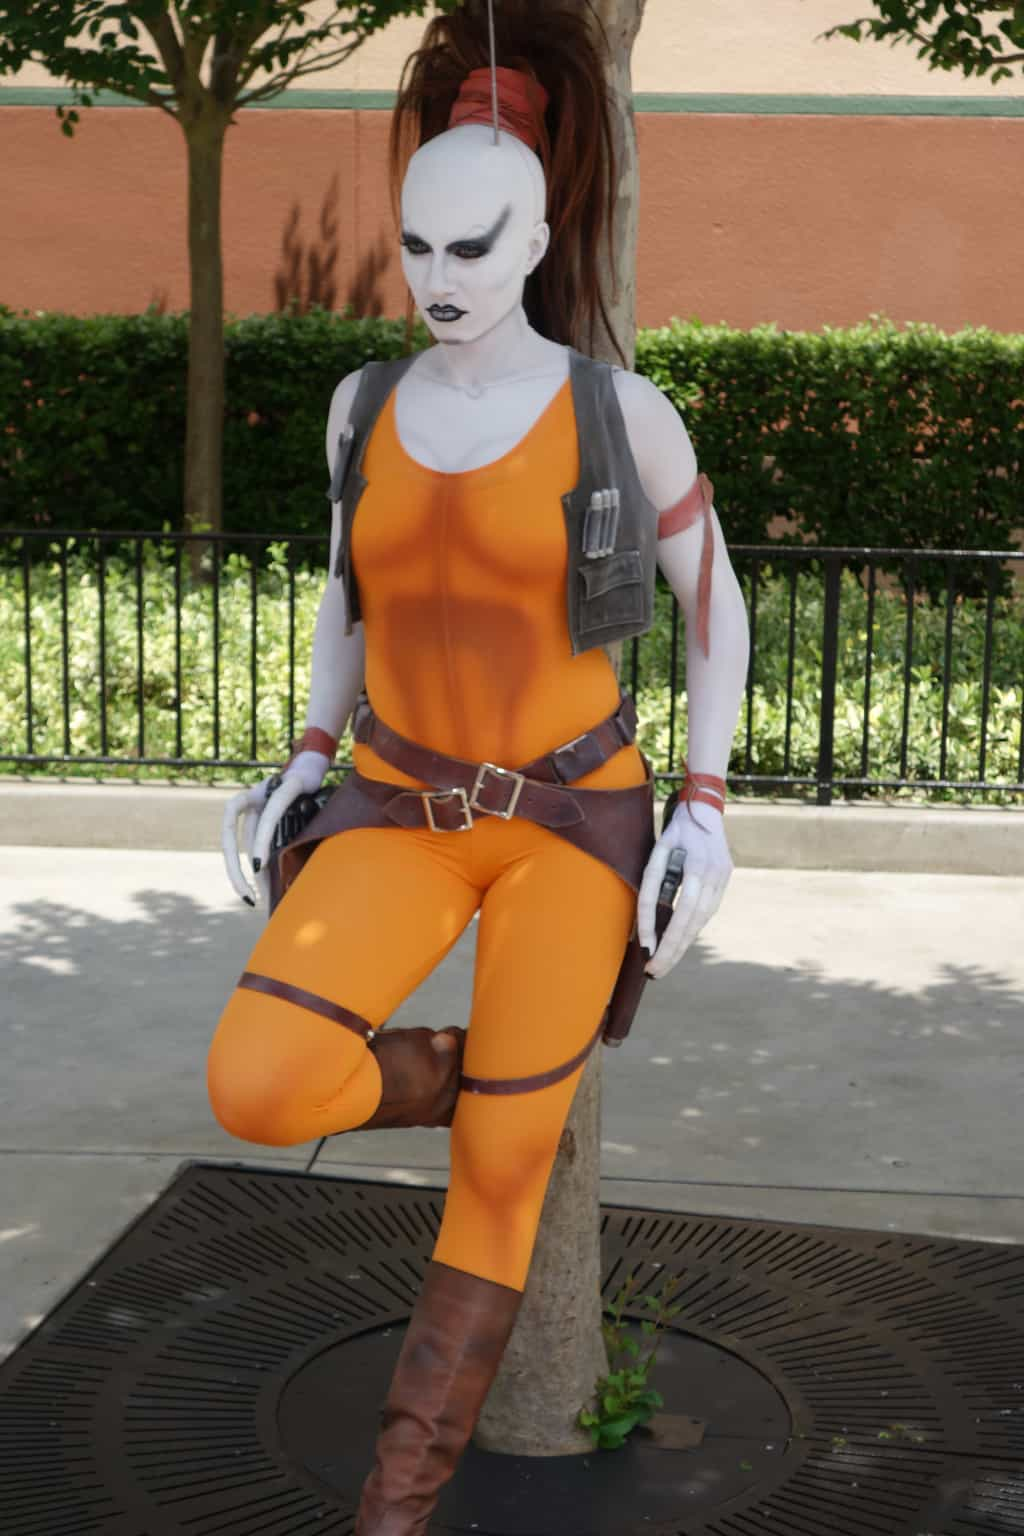 Aurra Sing Star Wars Weekends 2013 - Bad girl bounty hunter